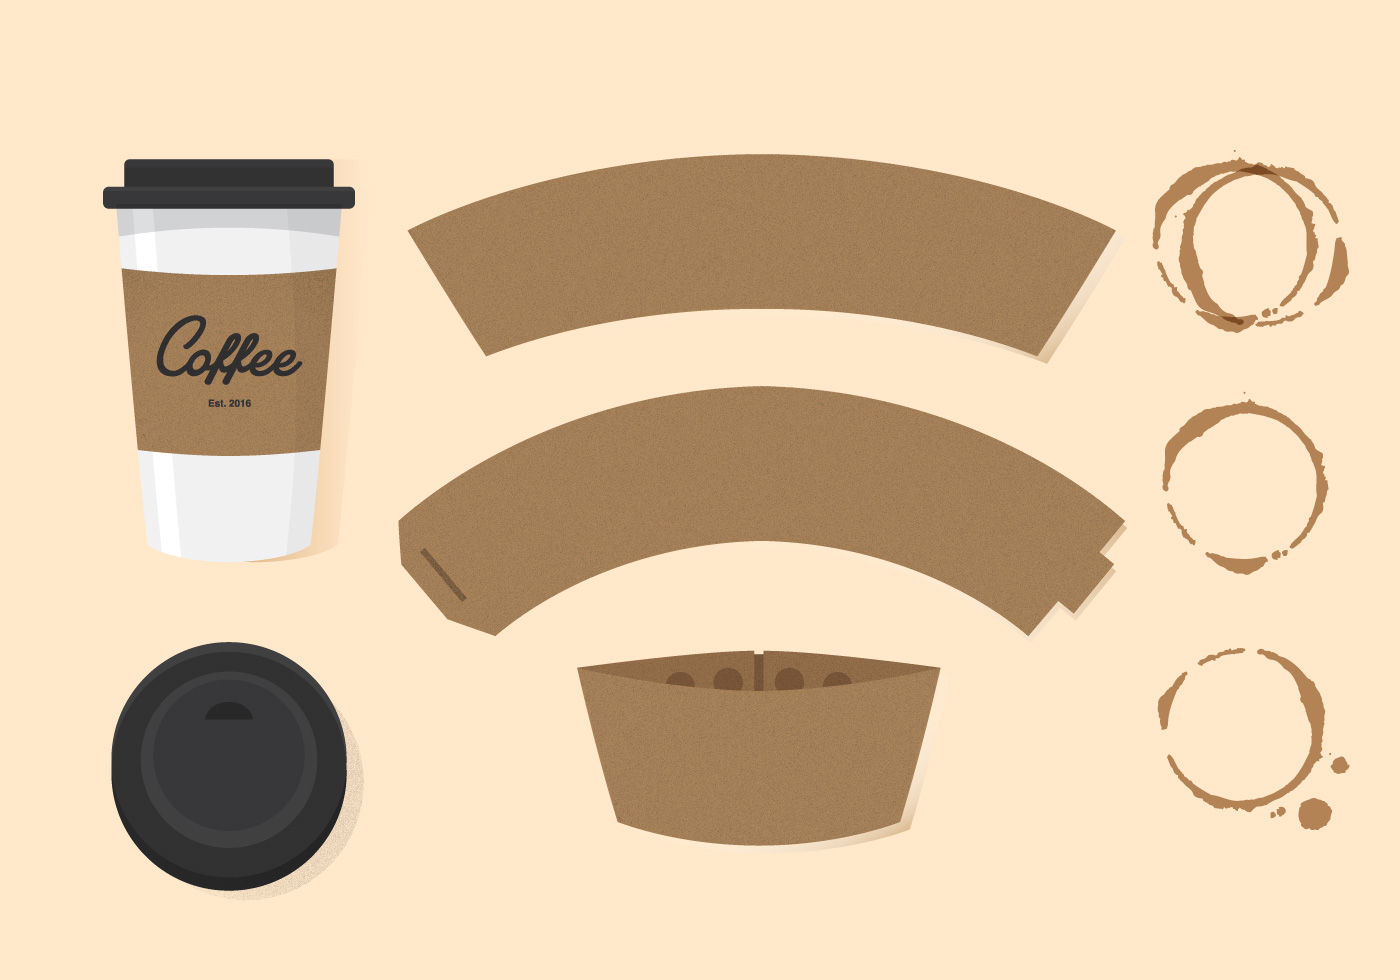 Starbucks Coffee Cup Sleeve Template Wwwpixsharkcom 8